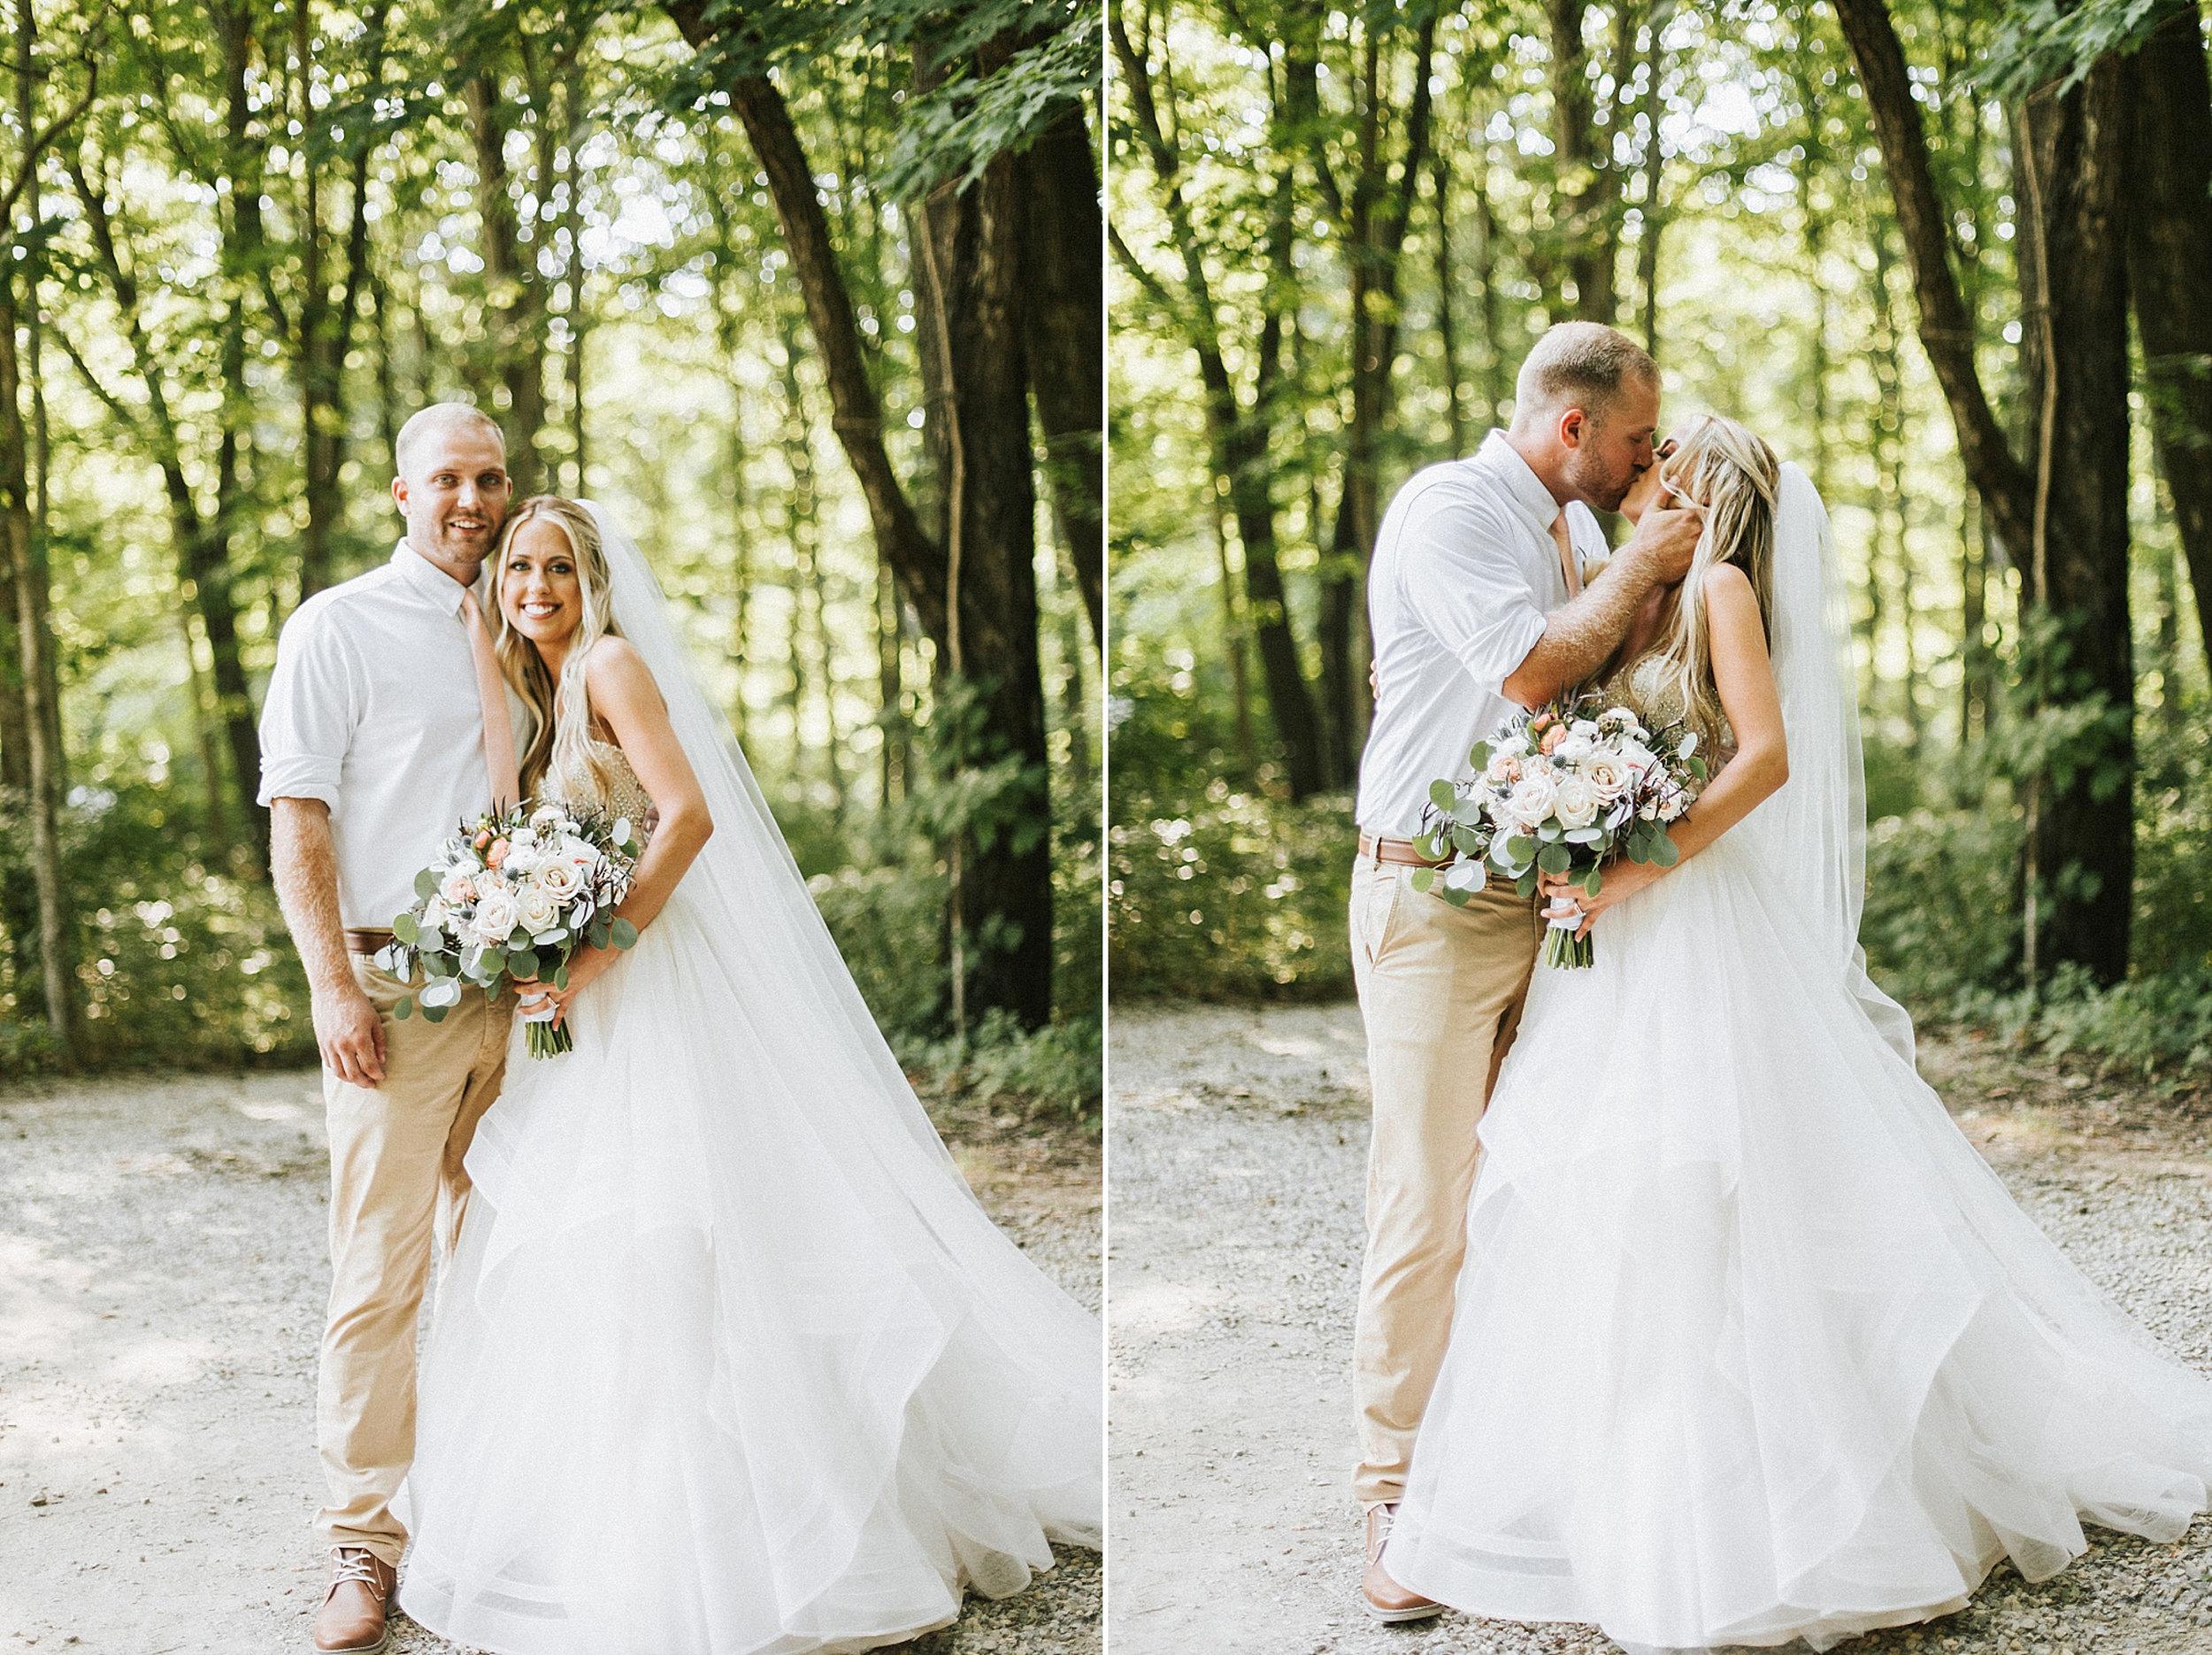 Brooke Townsend Photography - Cincinnati Wedding Photographer (87 of 153).jpg